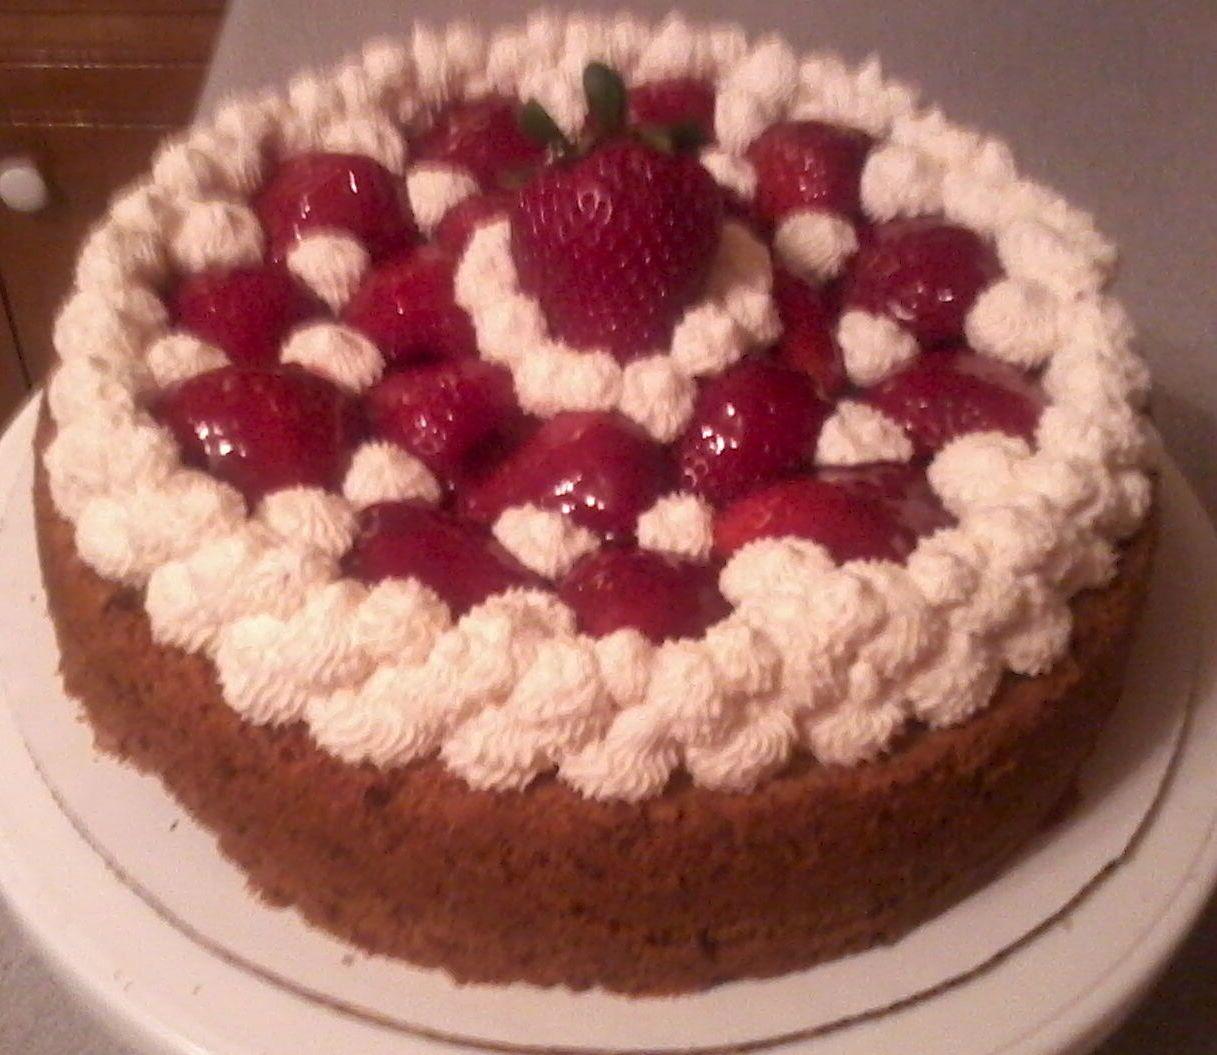 Strawberry Swirl Cheesecake...   Food & Drinks :)   Pinterest